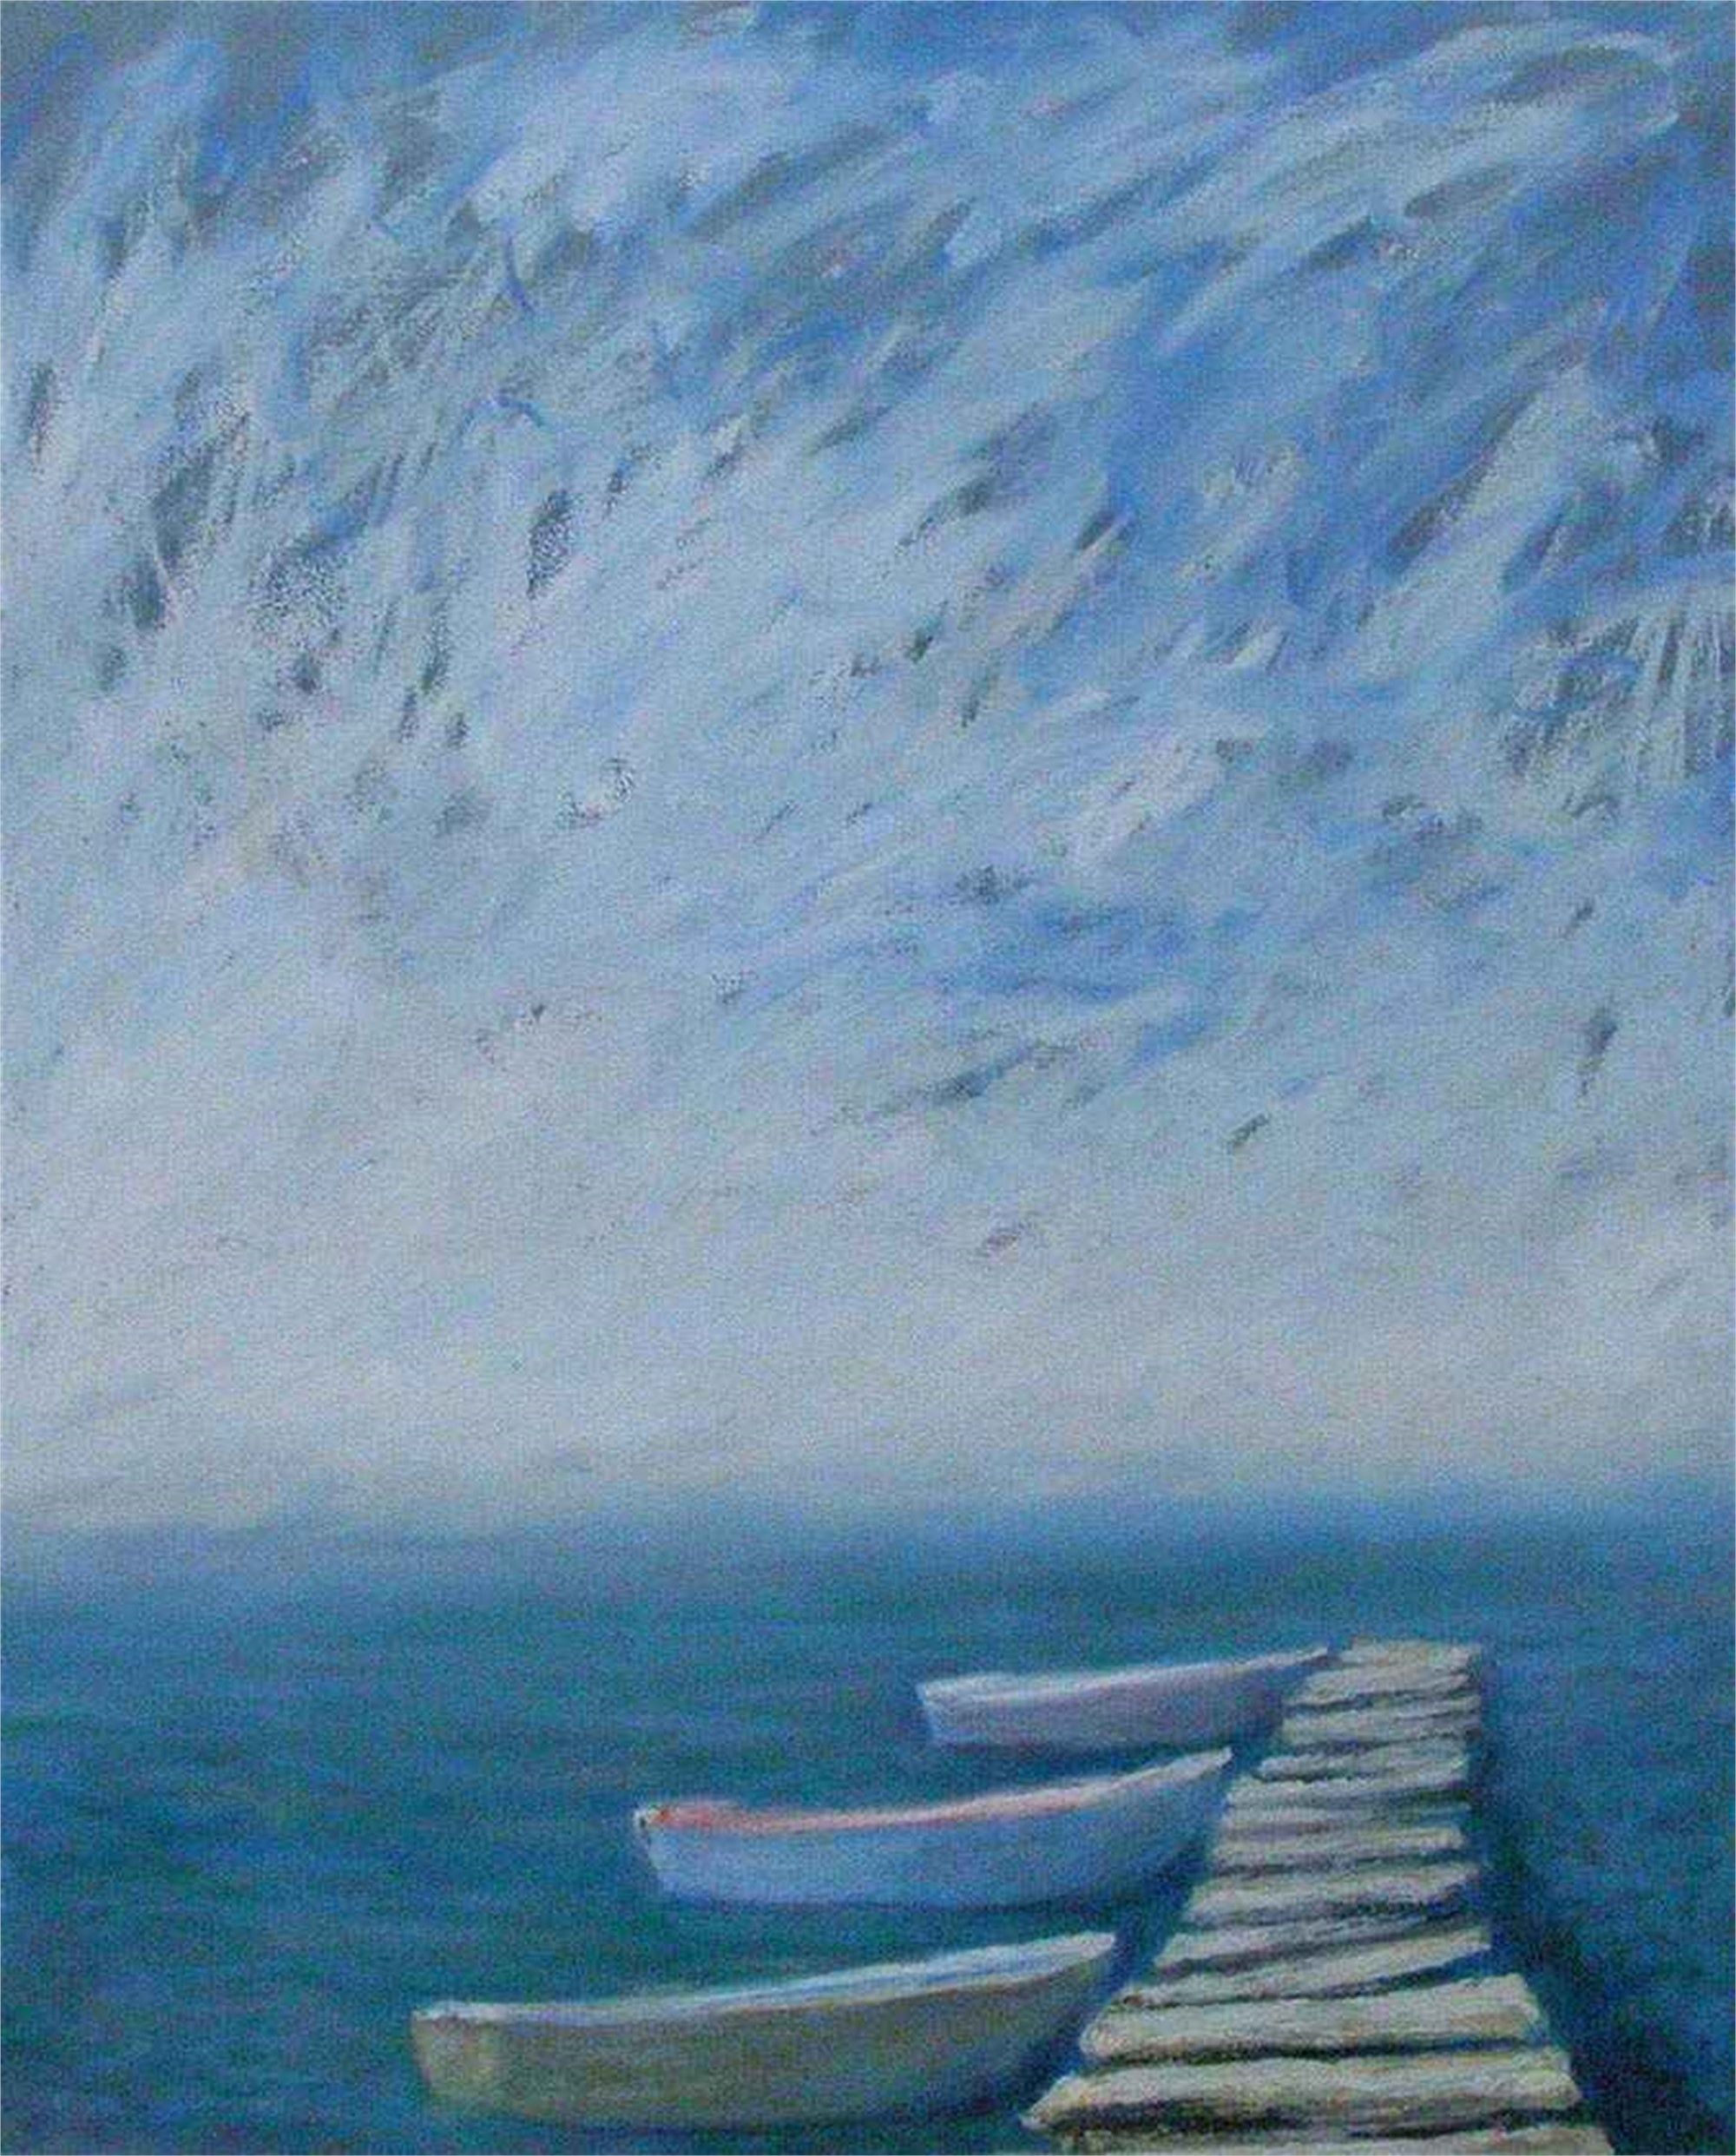 Three Boats at Dock by John Gaitenby